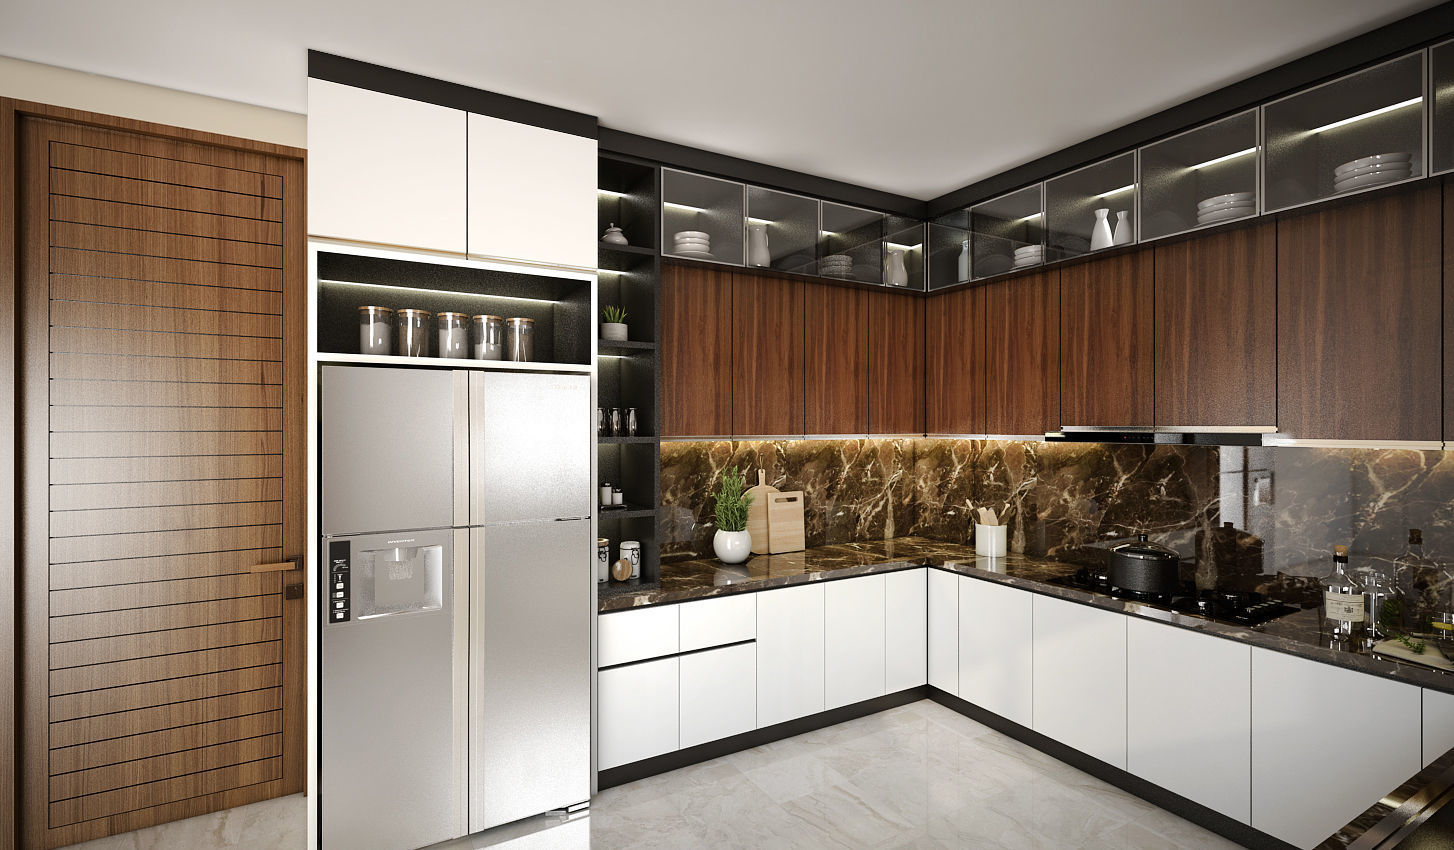 Kitchen Set sketchup 3D model | CGTrader on Model Kitchen Photo  id=23255